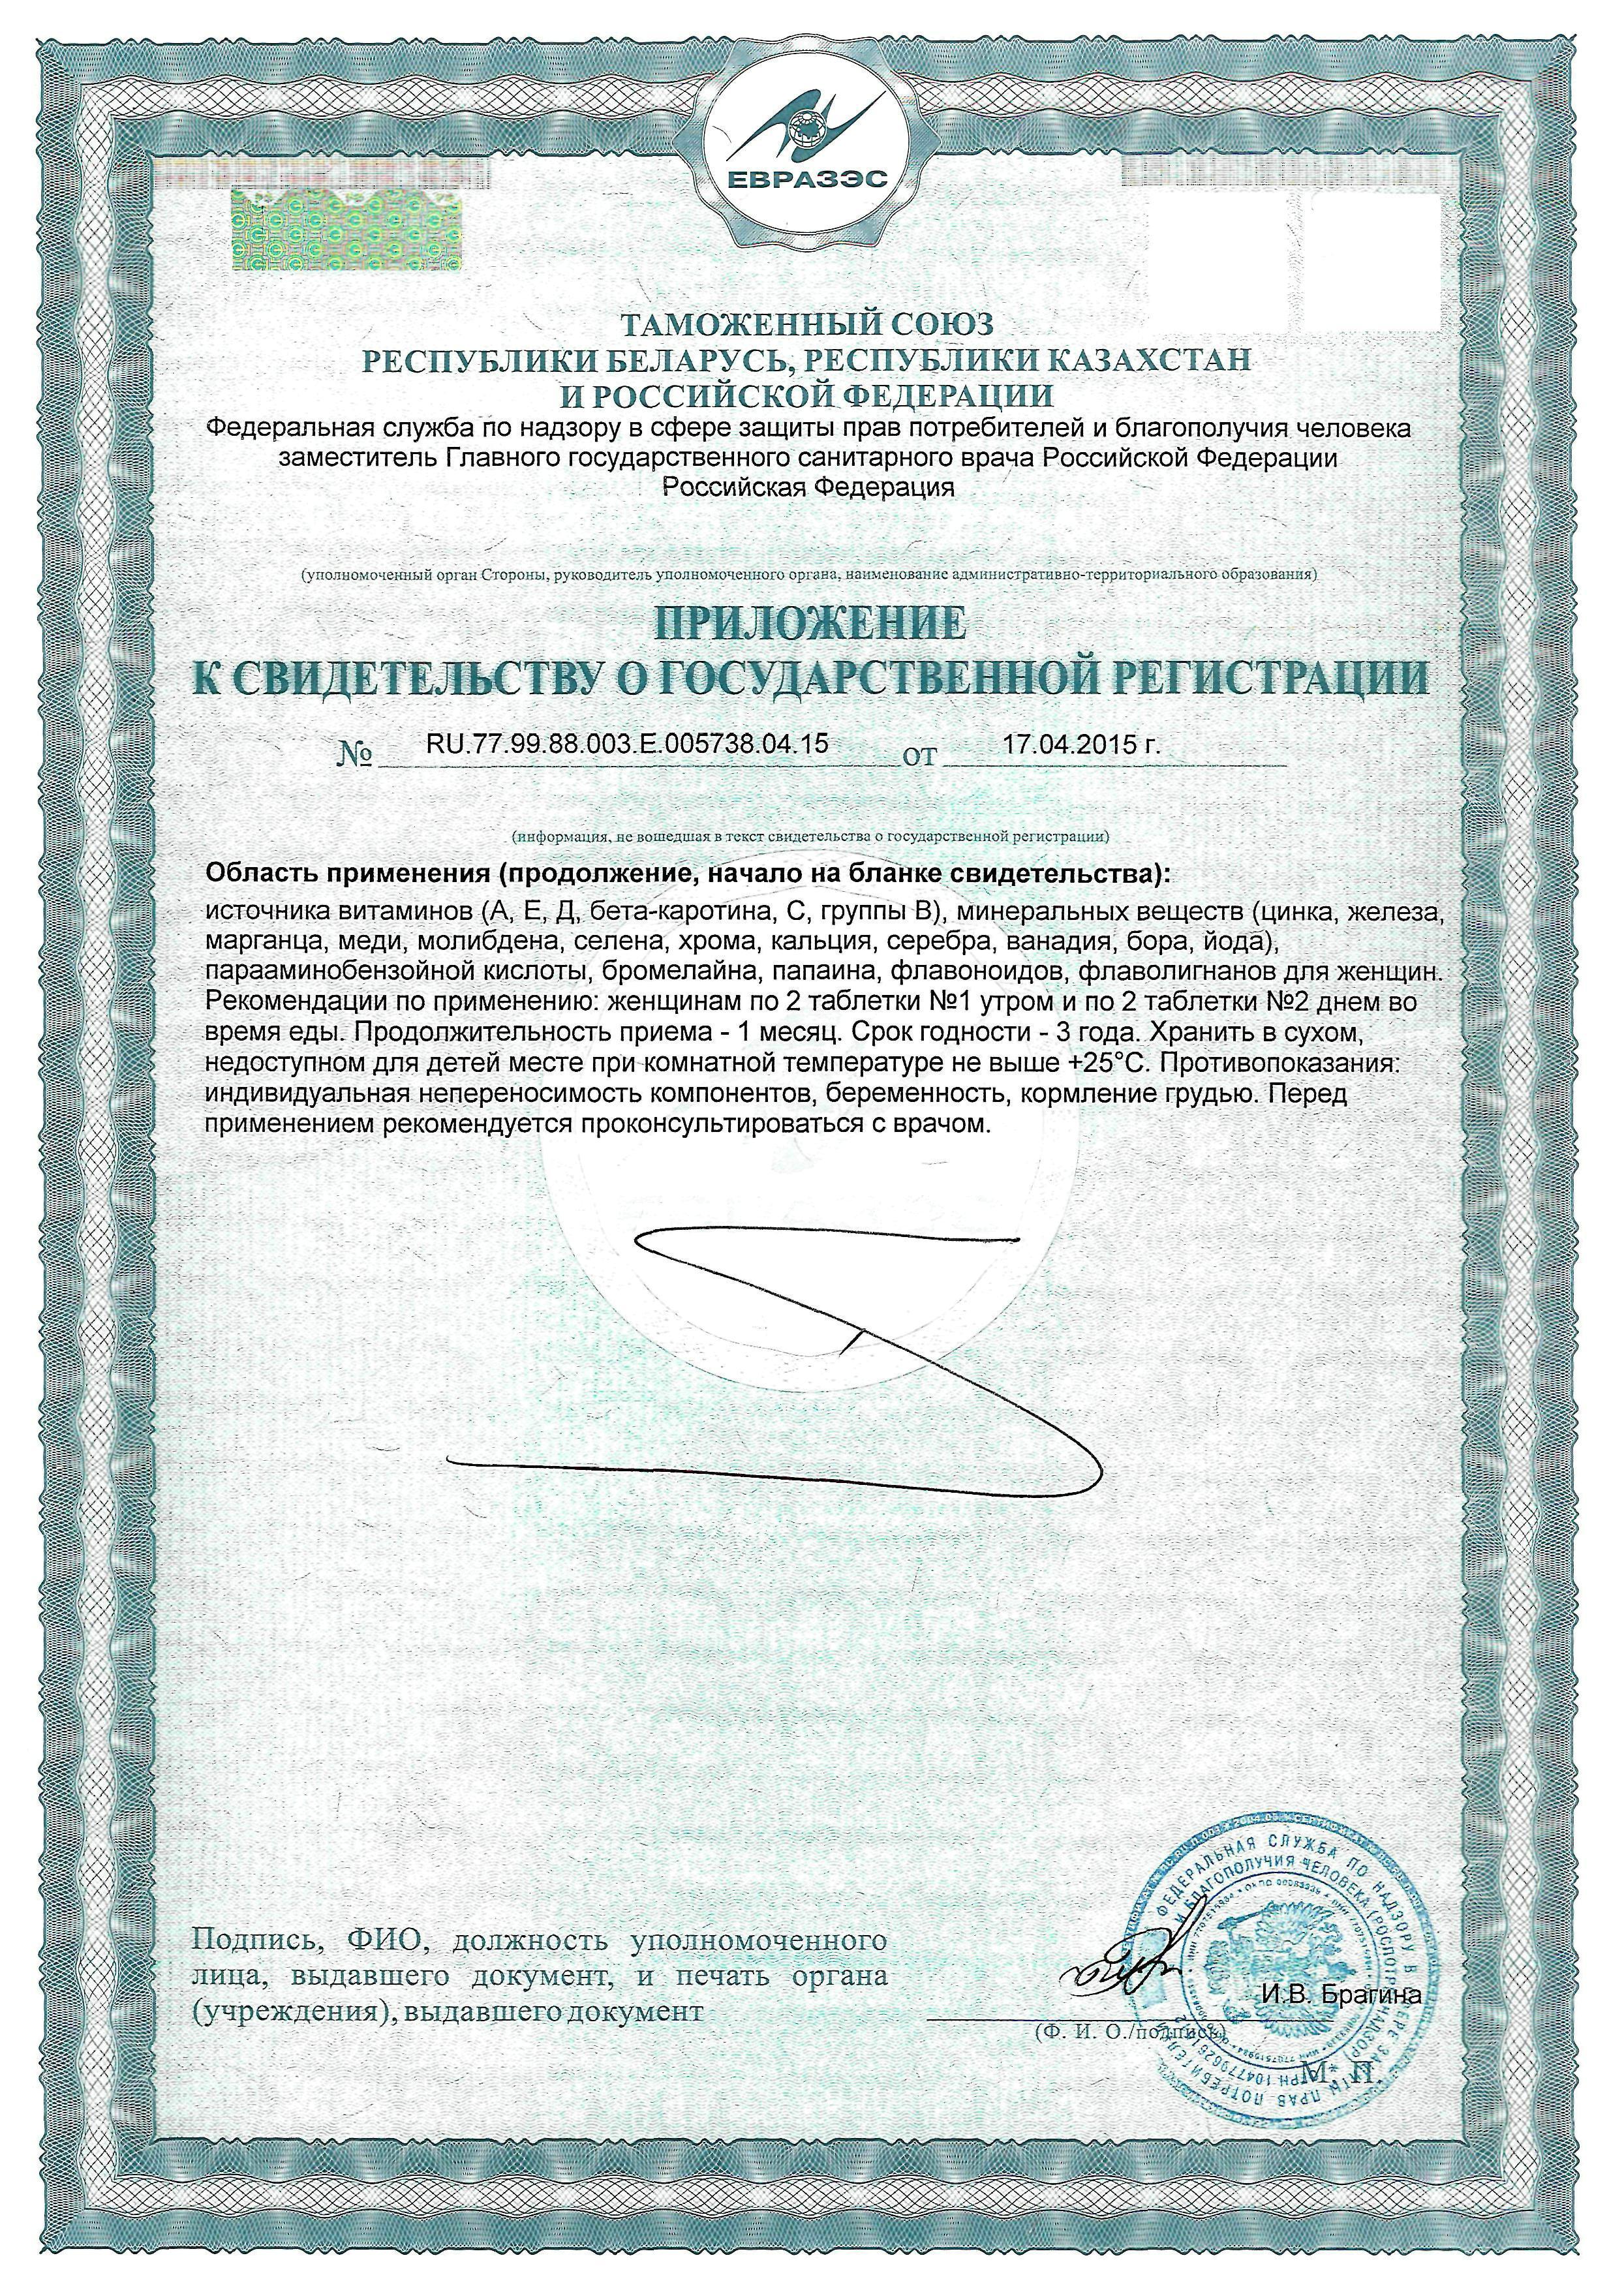 diskaveri_ocharovanie_sgr_tr_ts_prilozhenieСвидетельства_о_государственной_регистрации_продукции.jpg